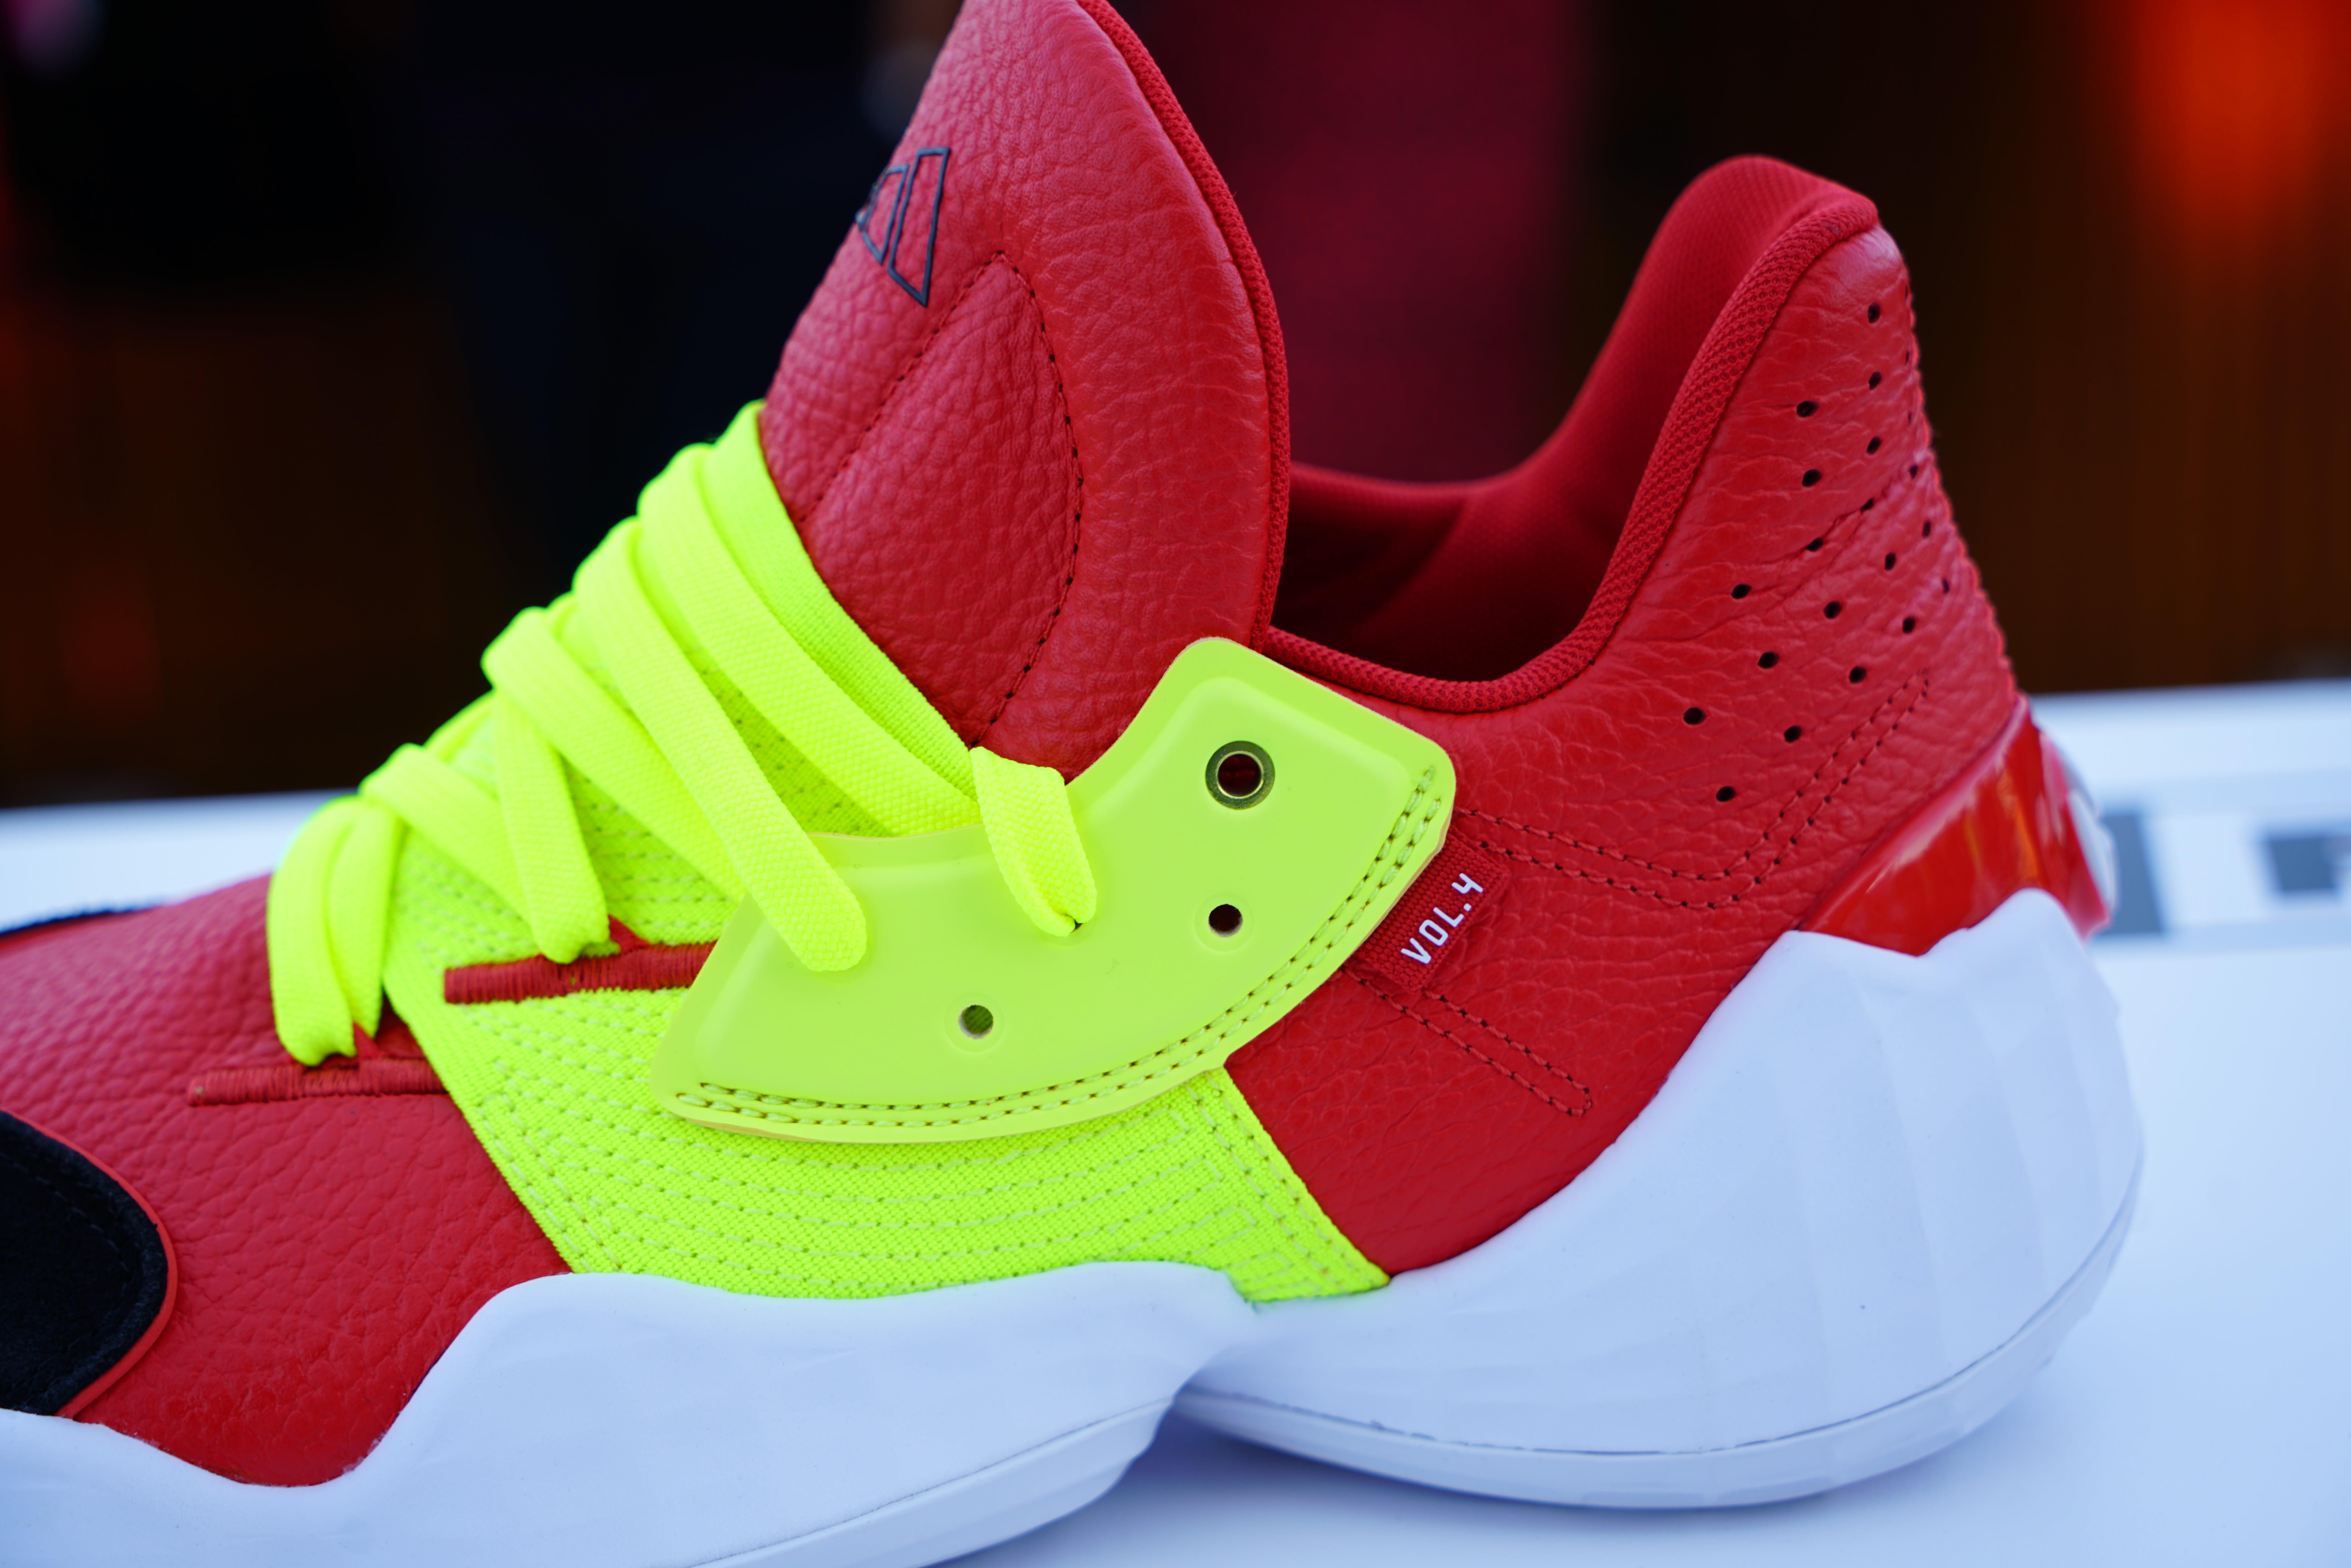 Adidas Harden Vol. 4 'Red/Neon'